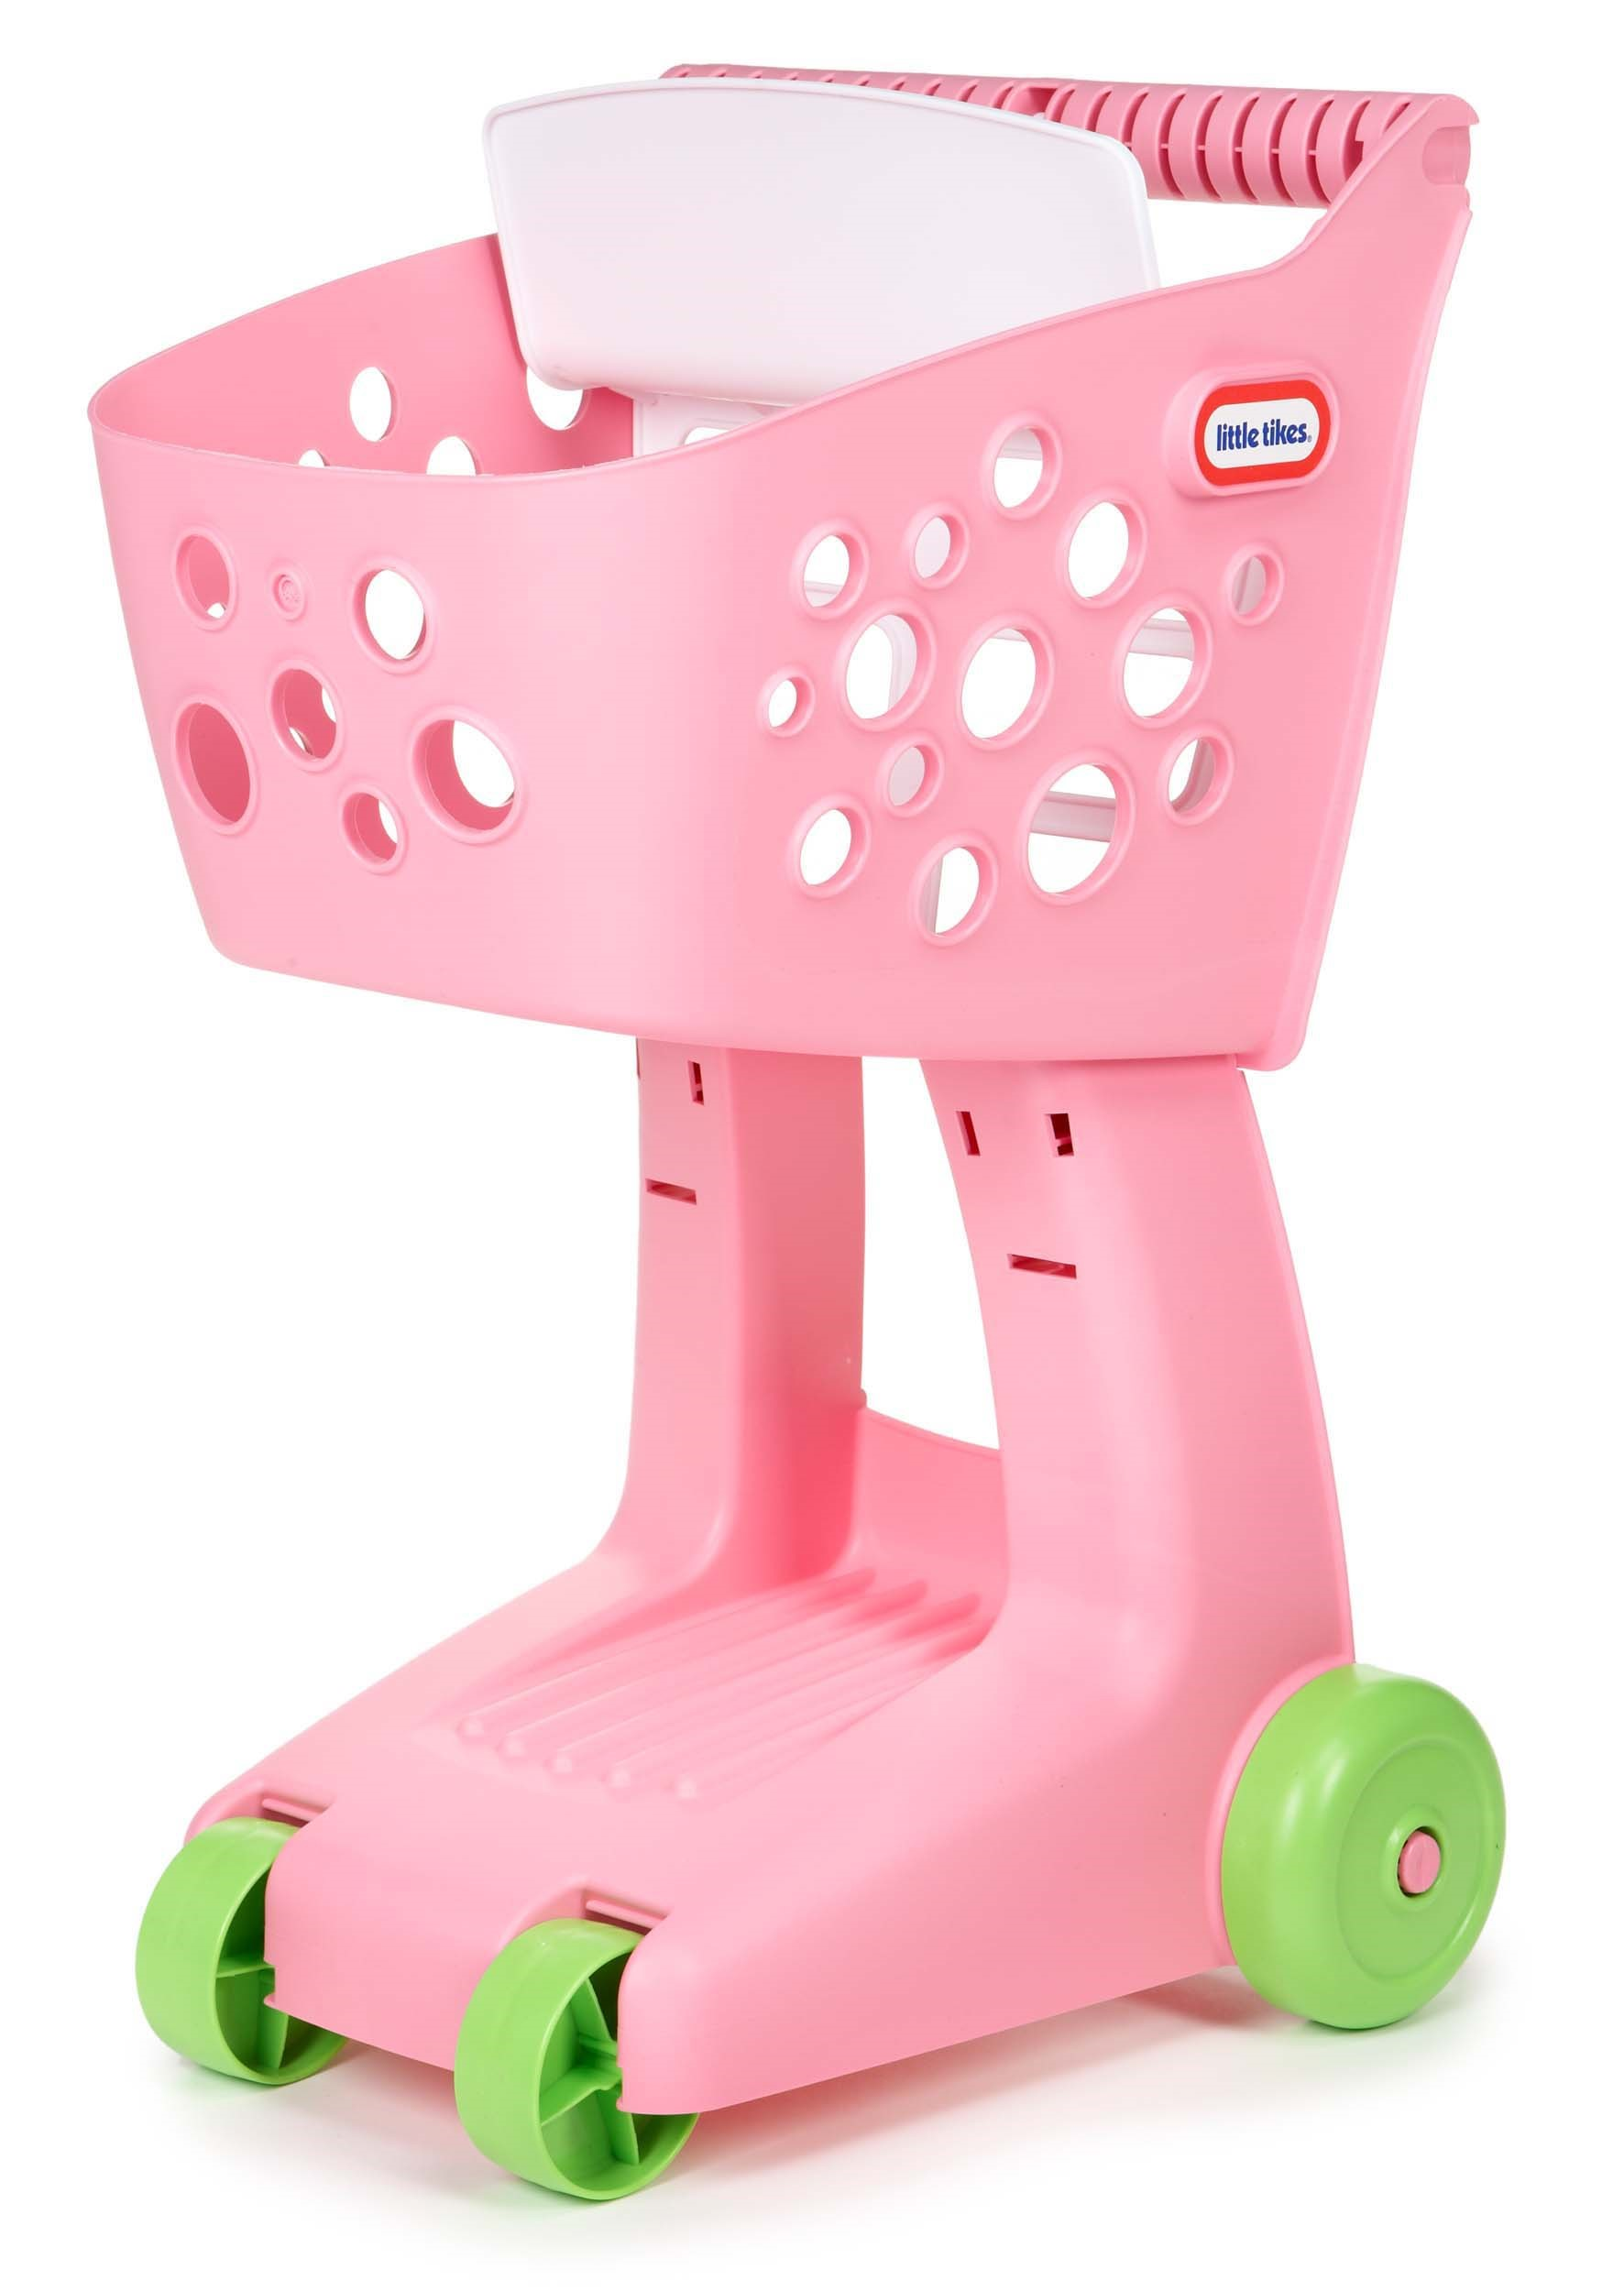 Little Tikes Lil Shopper Pink